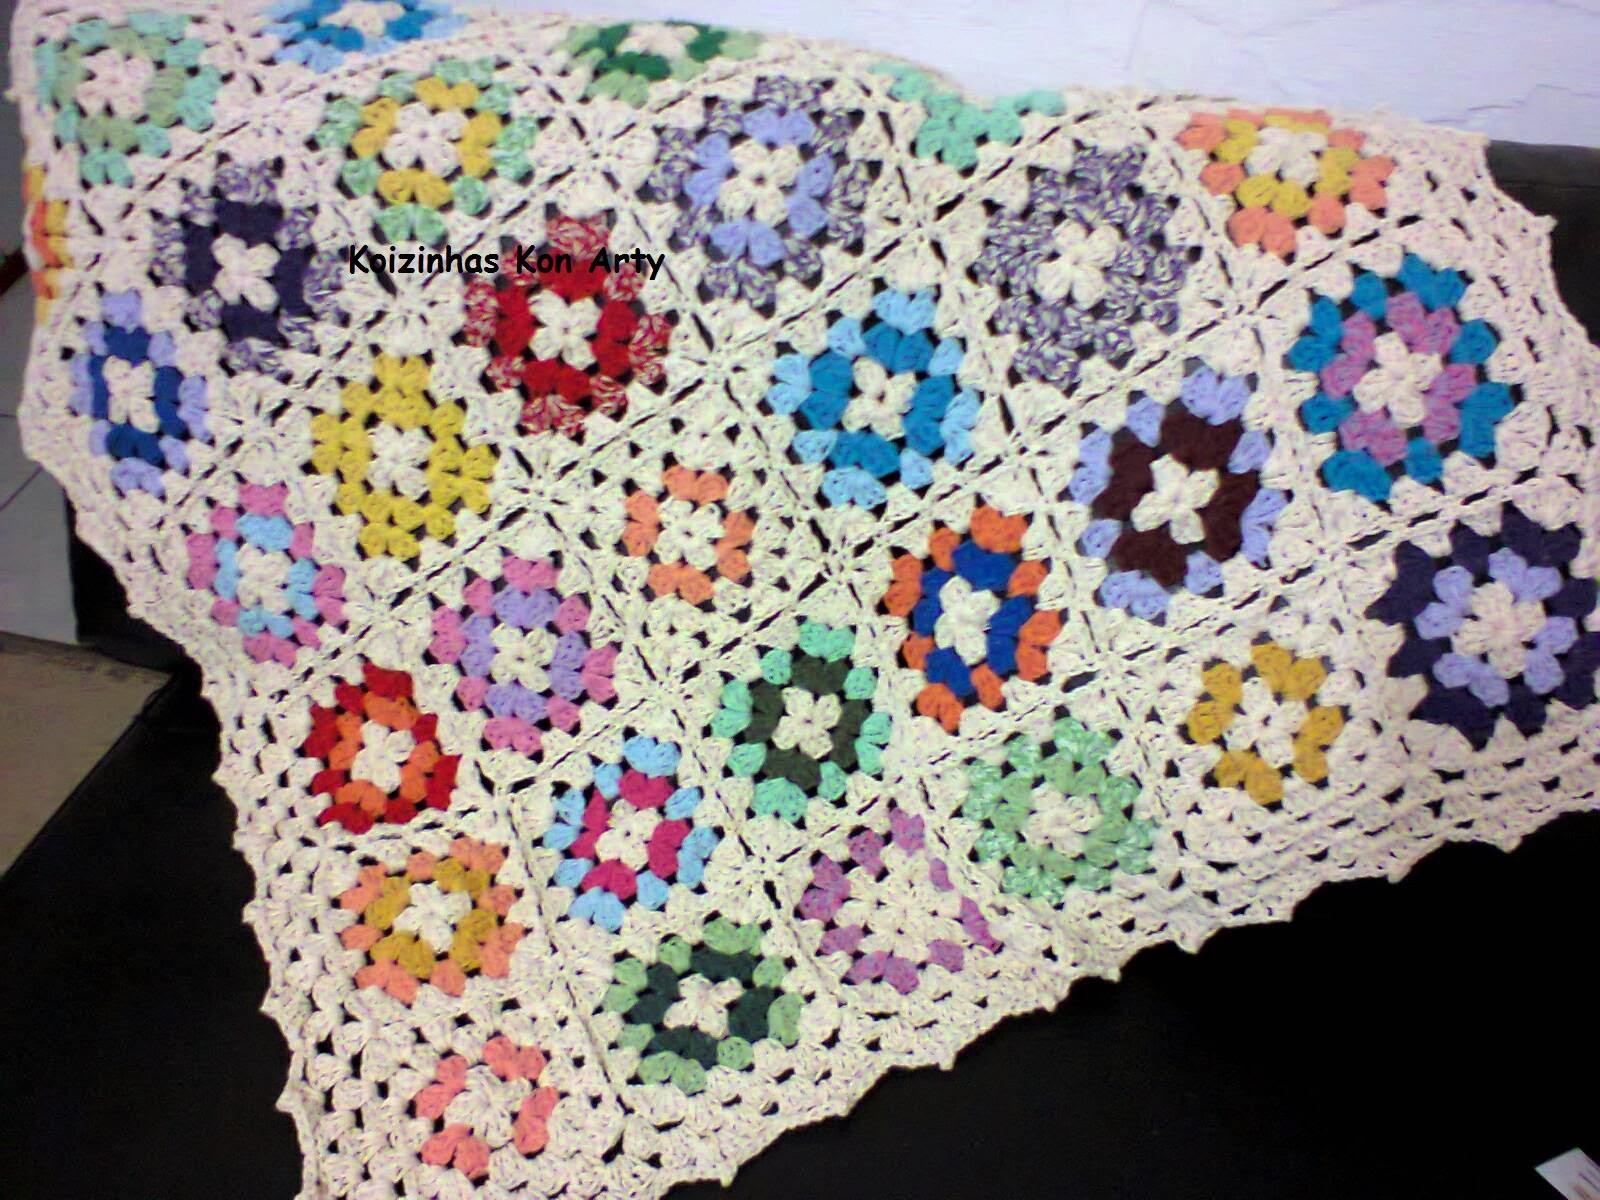 Koizinhas kon arty croch artesanato manta de sof - Manta de sofa ...